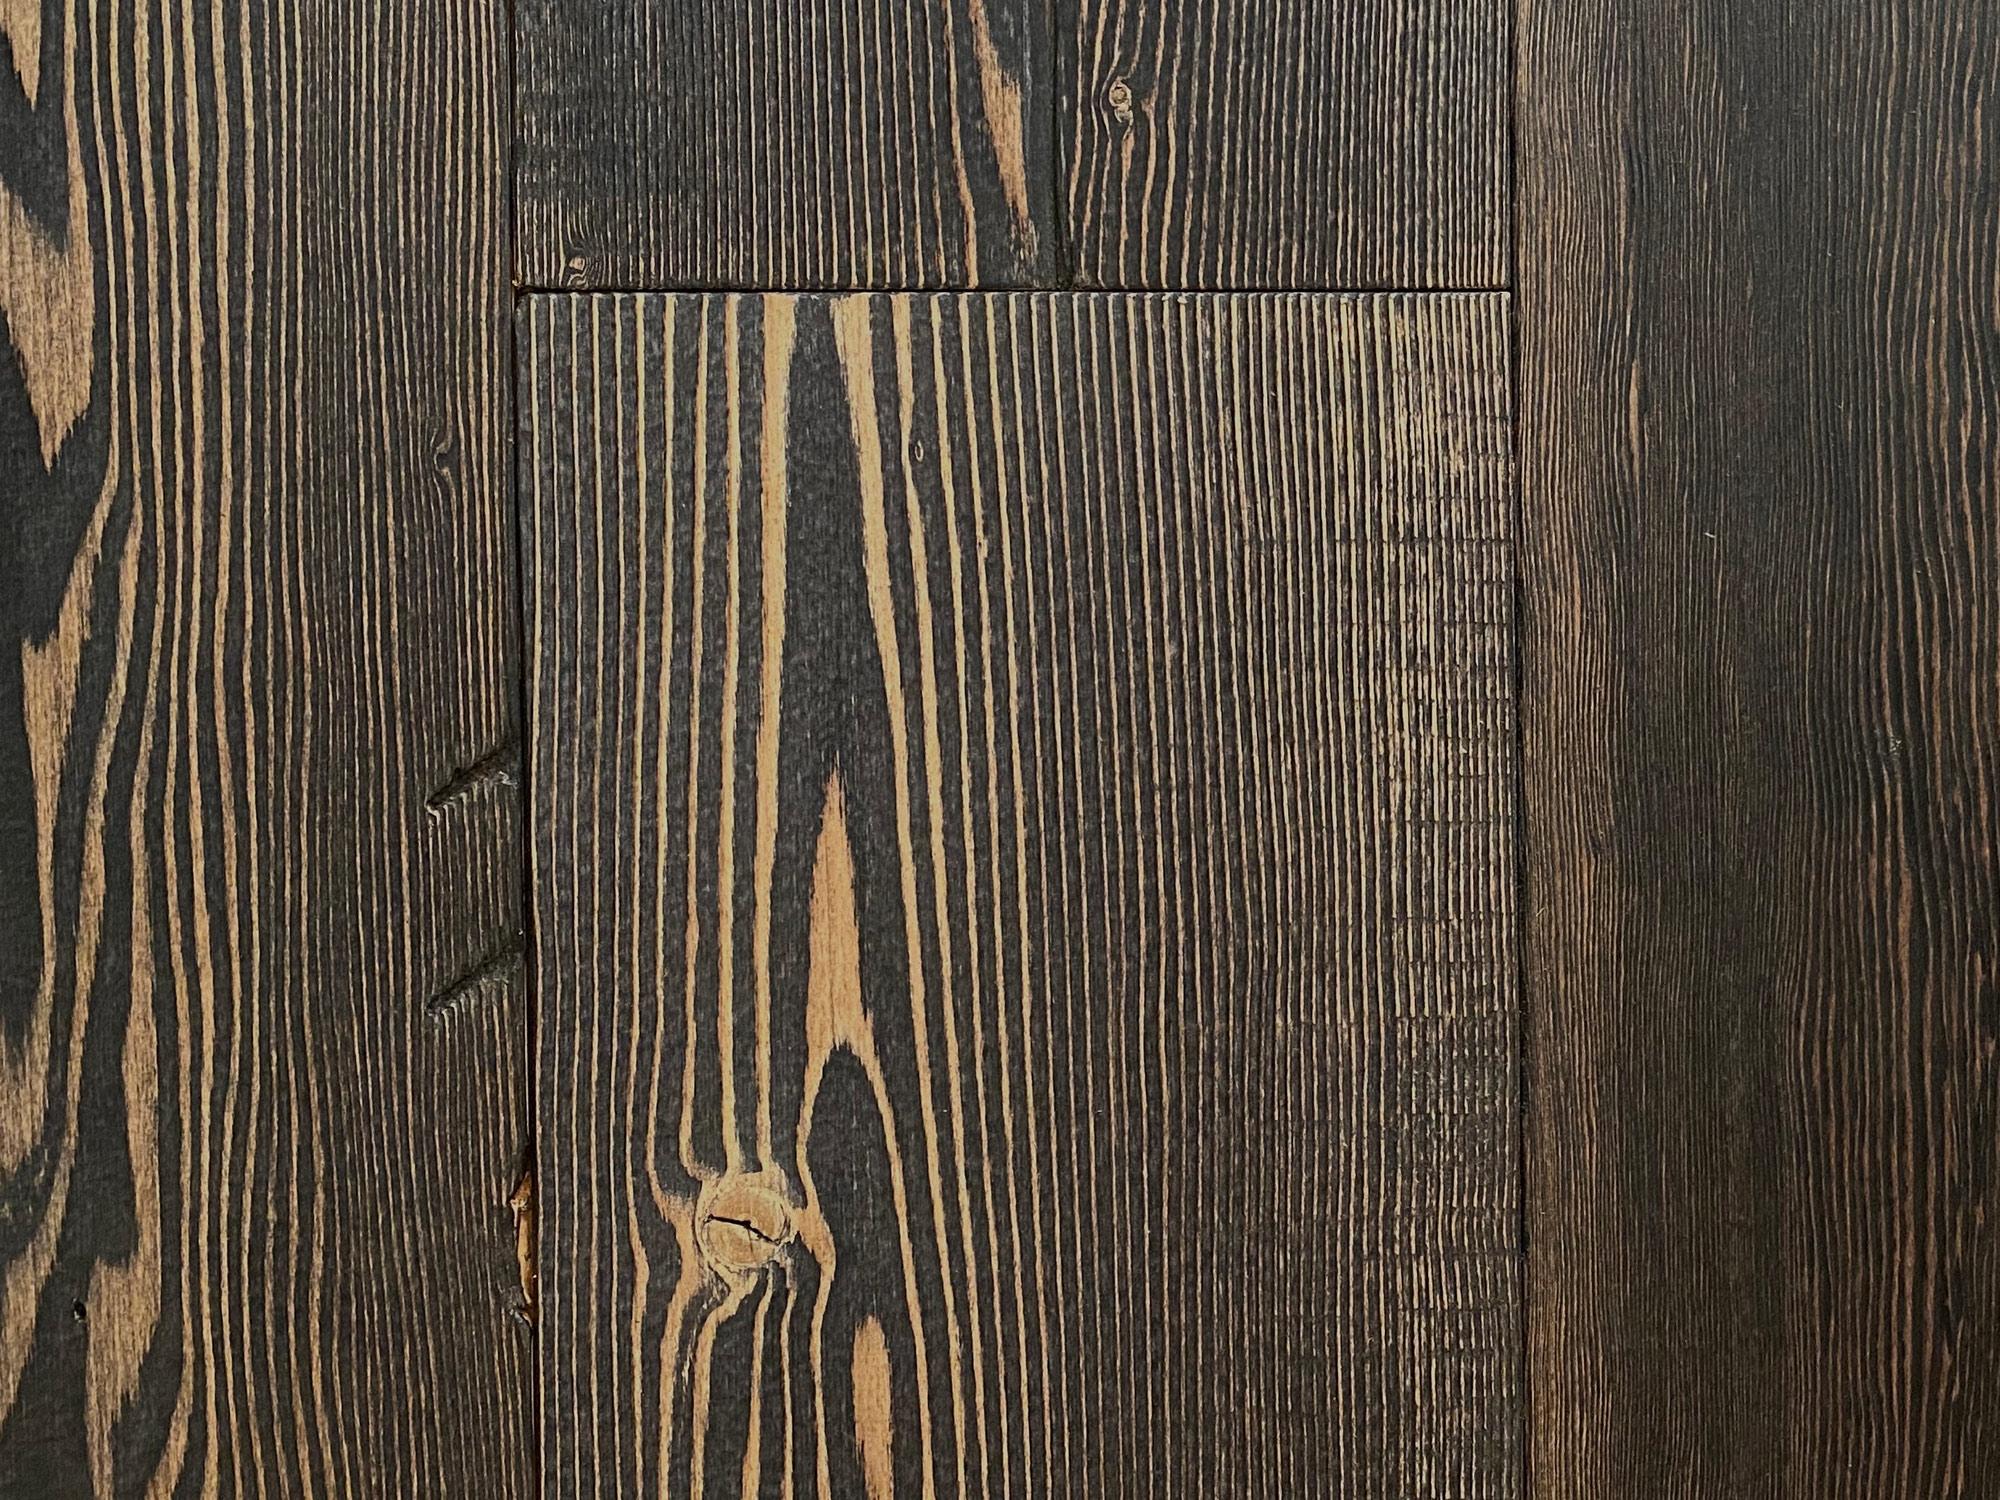 Douglas fir floor planks